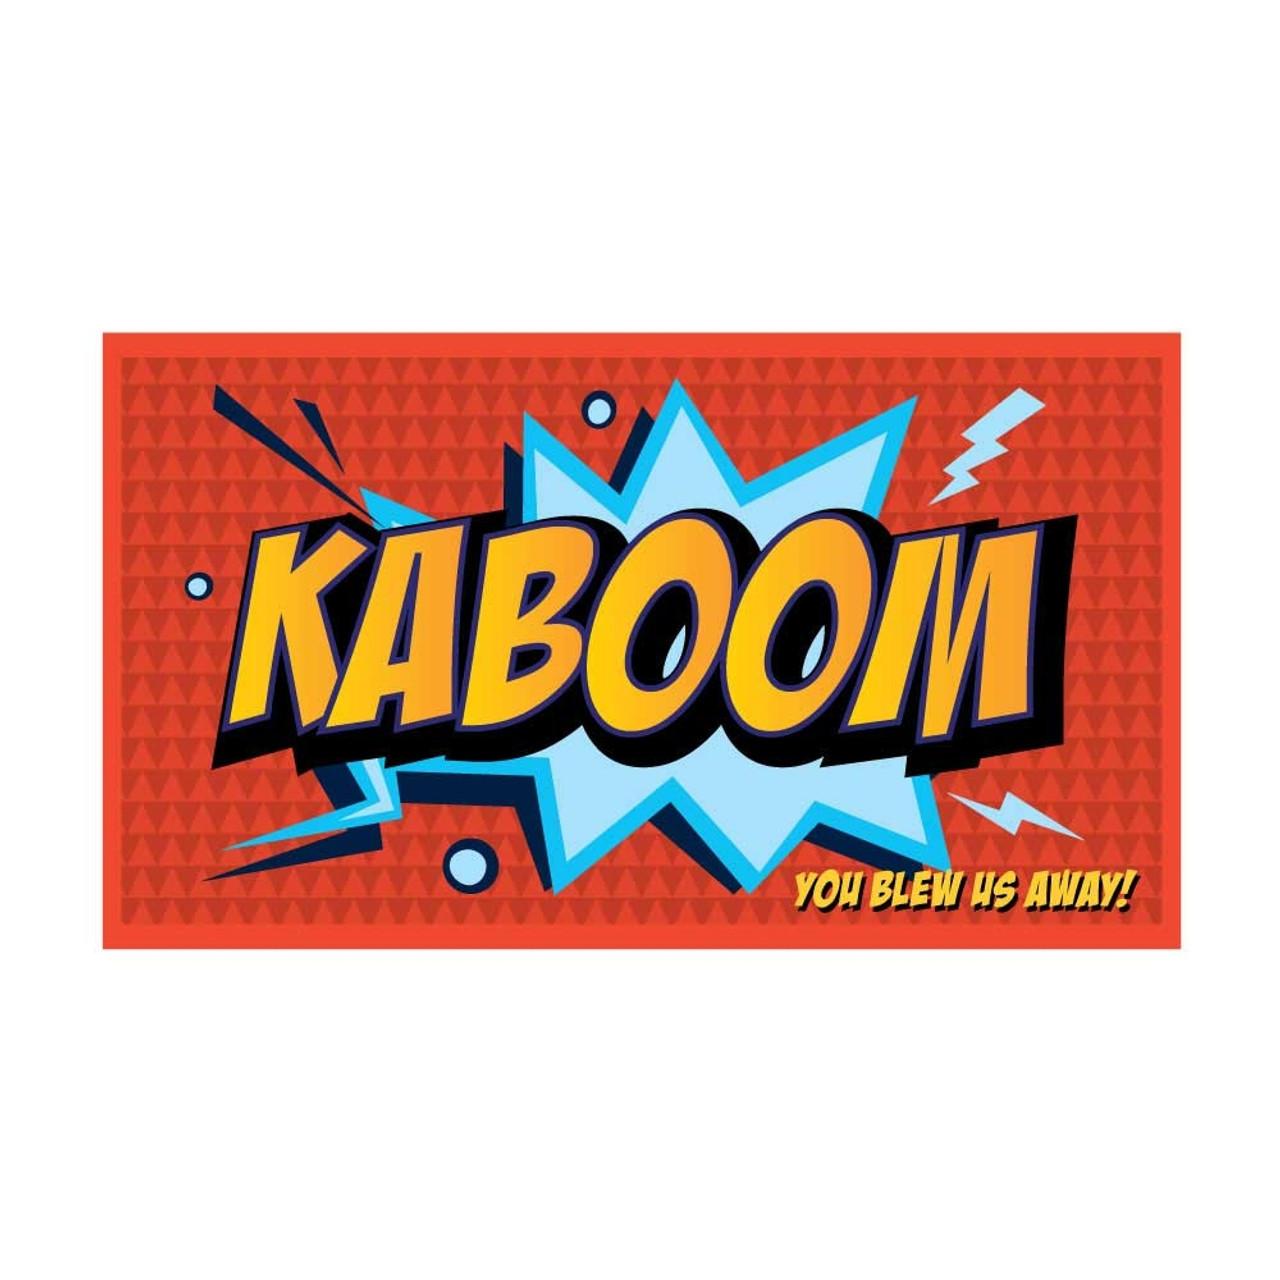 Kartoon Kudos; Kaboom